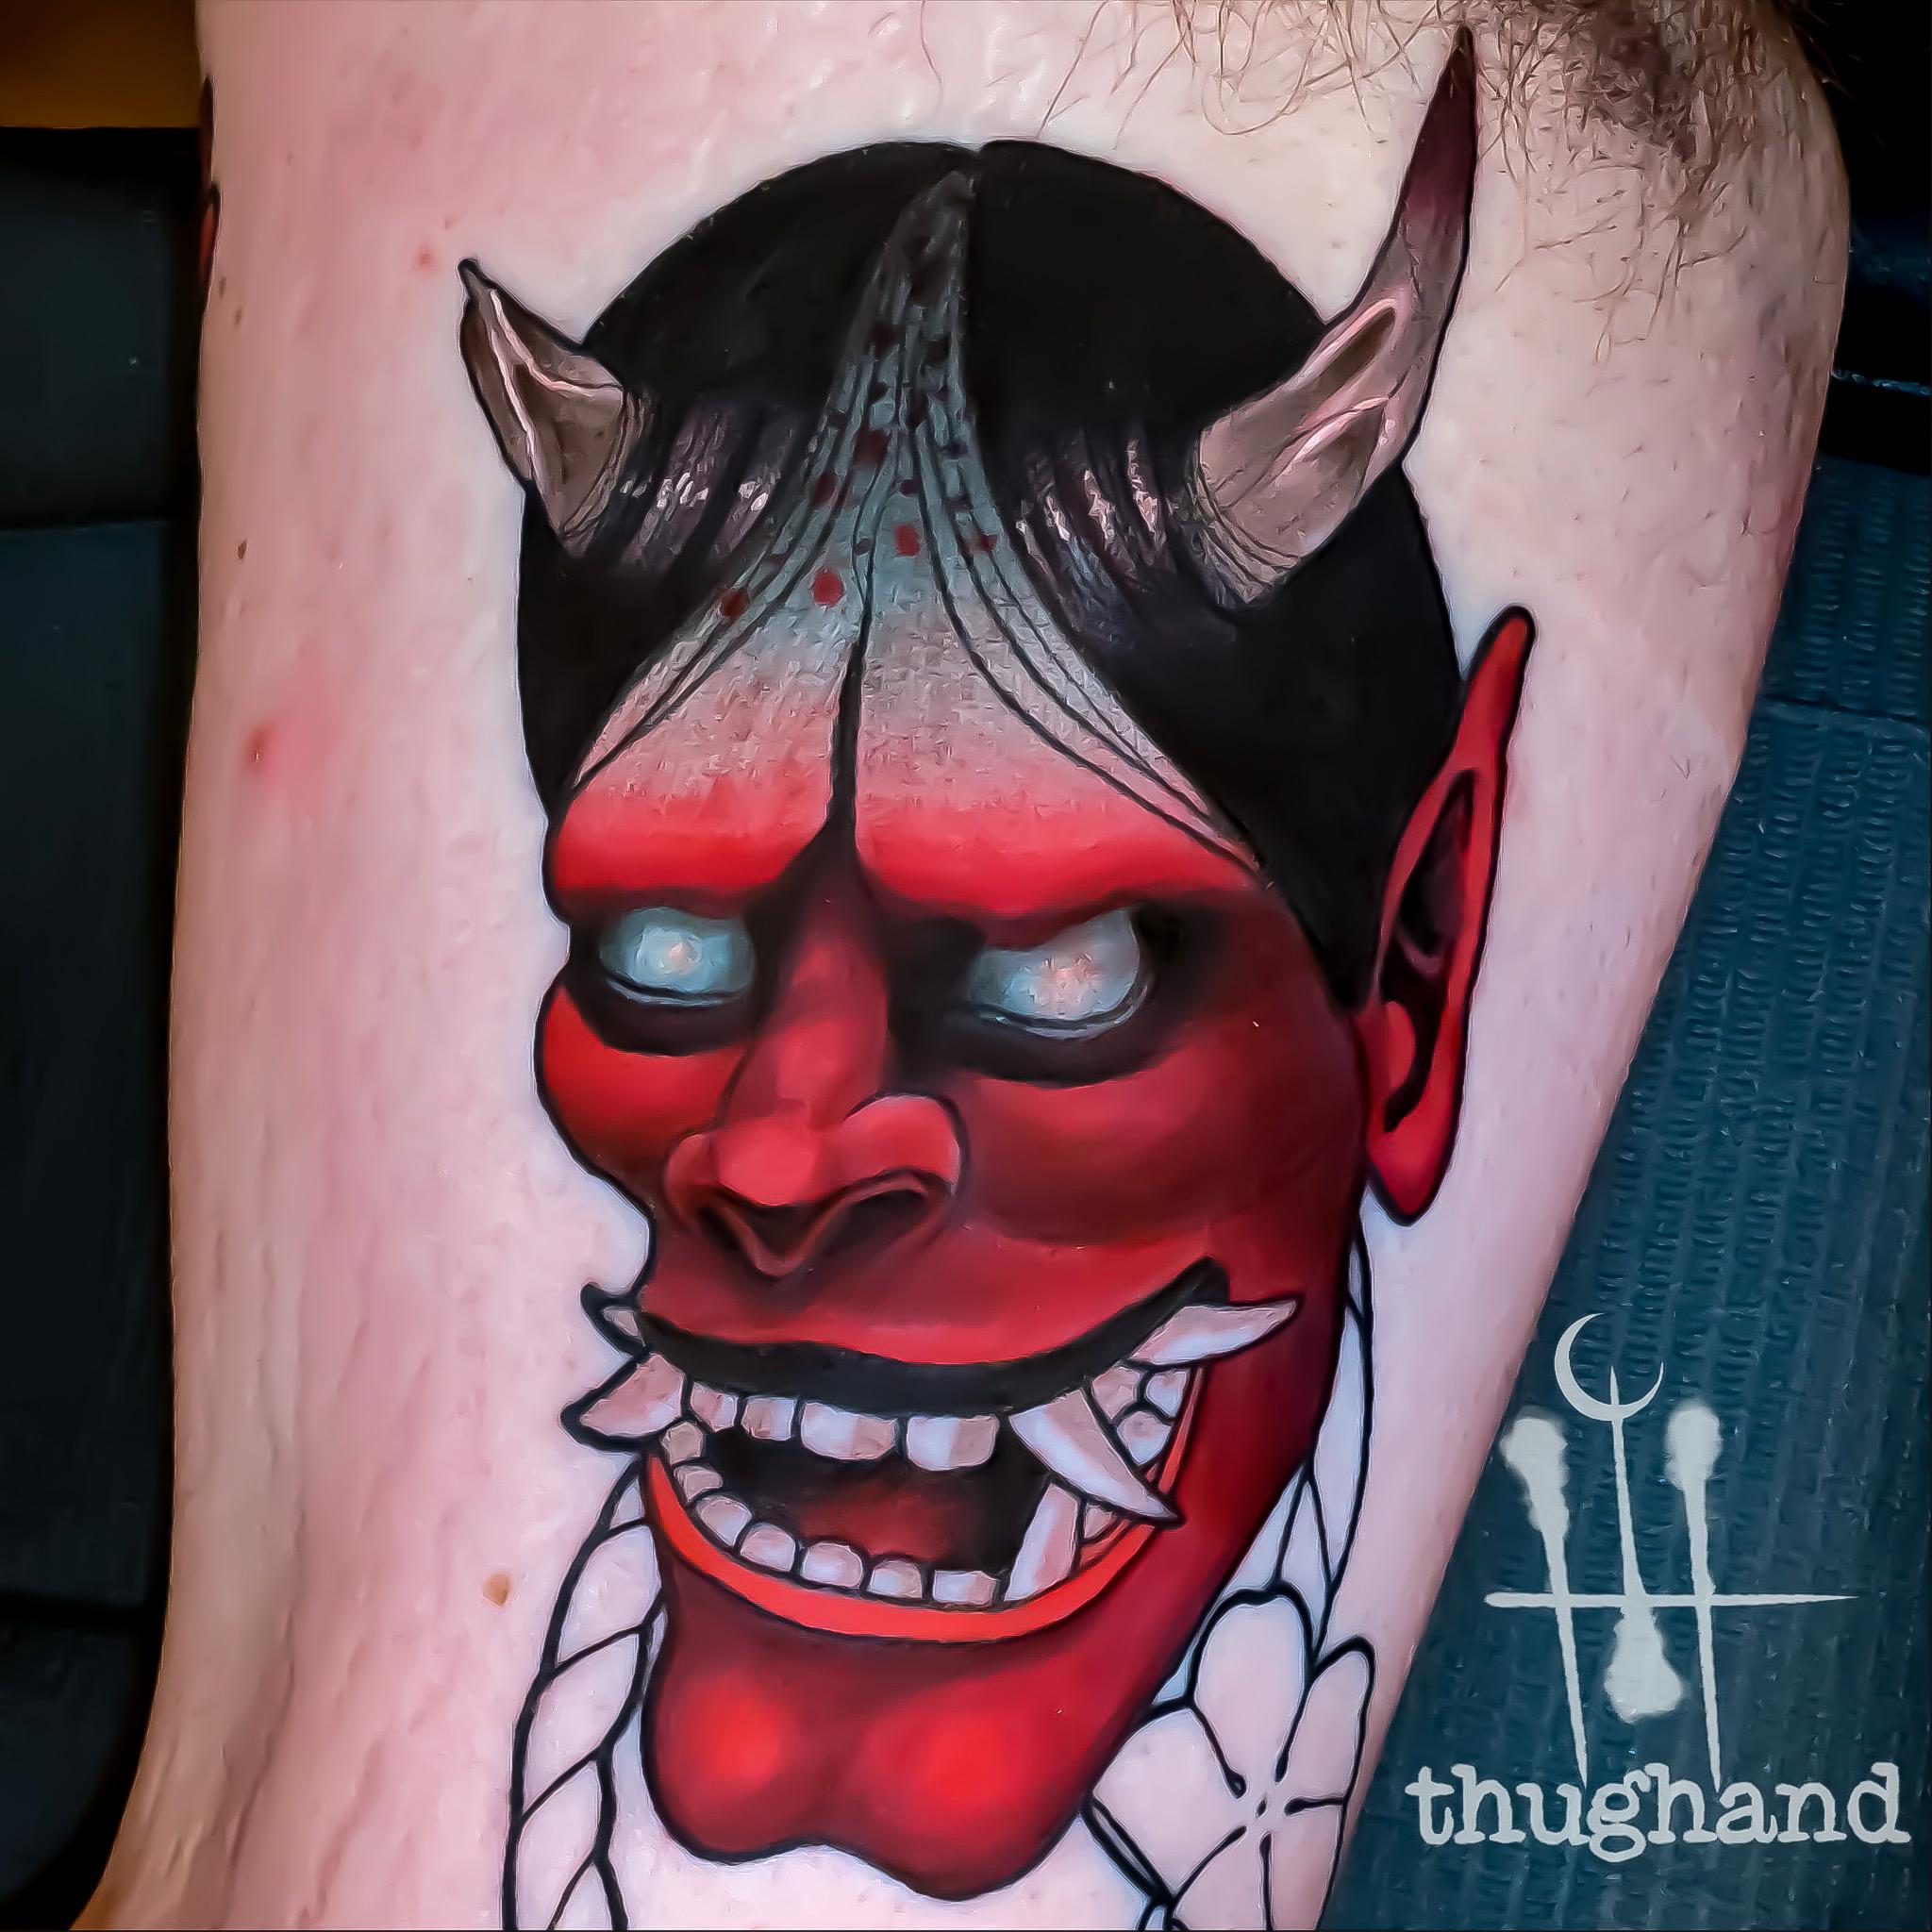 hannya mask - Tattoo by Doug Hand #DougHand #illustrative #neotrad #neotraditional #philly #philadelphia #japanese #irezumi #hannya